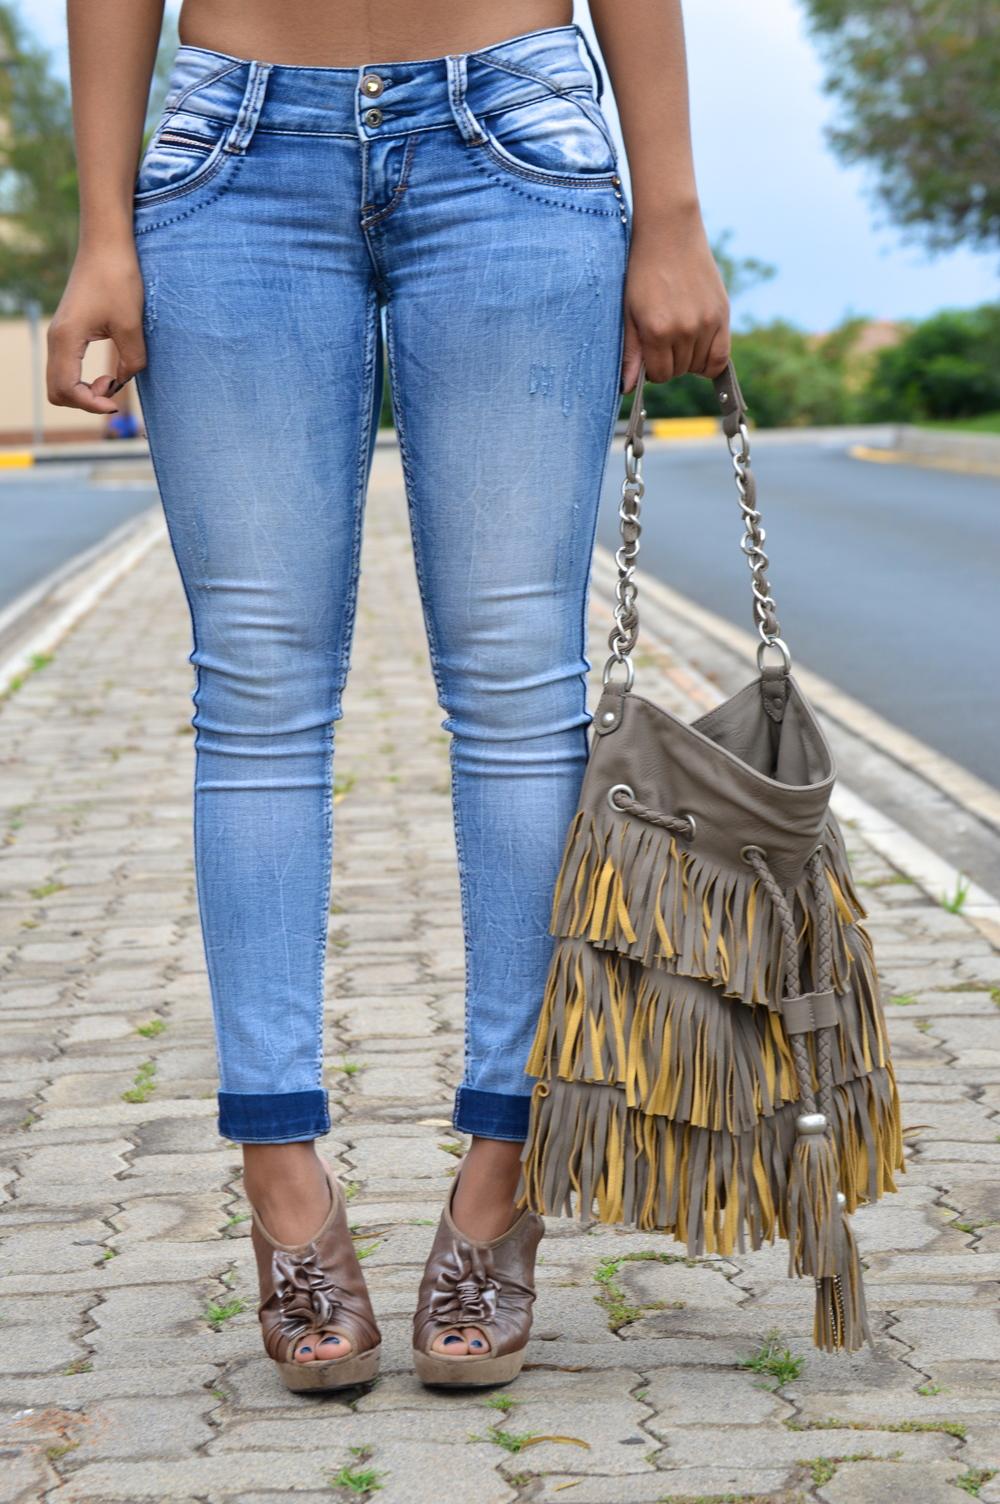 Kaylista_jeans3